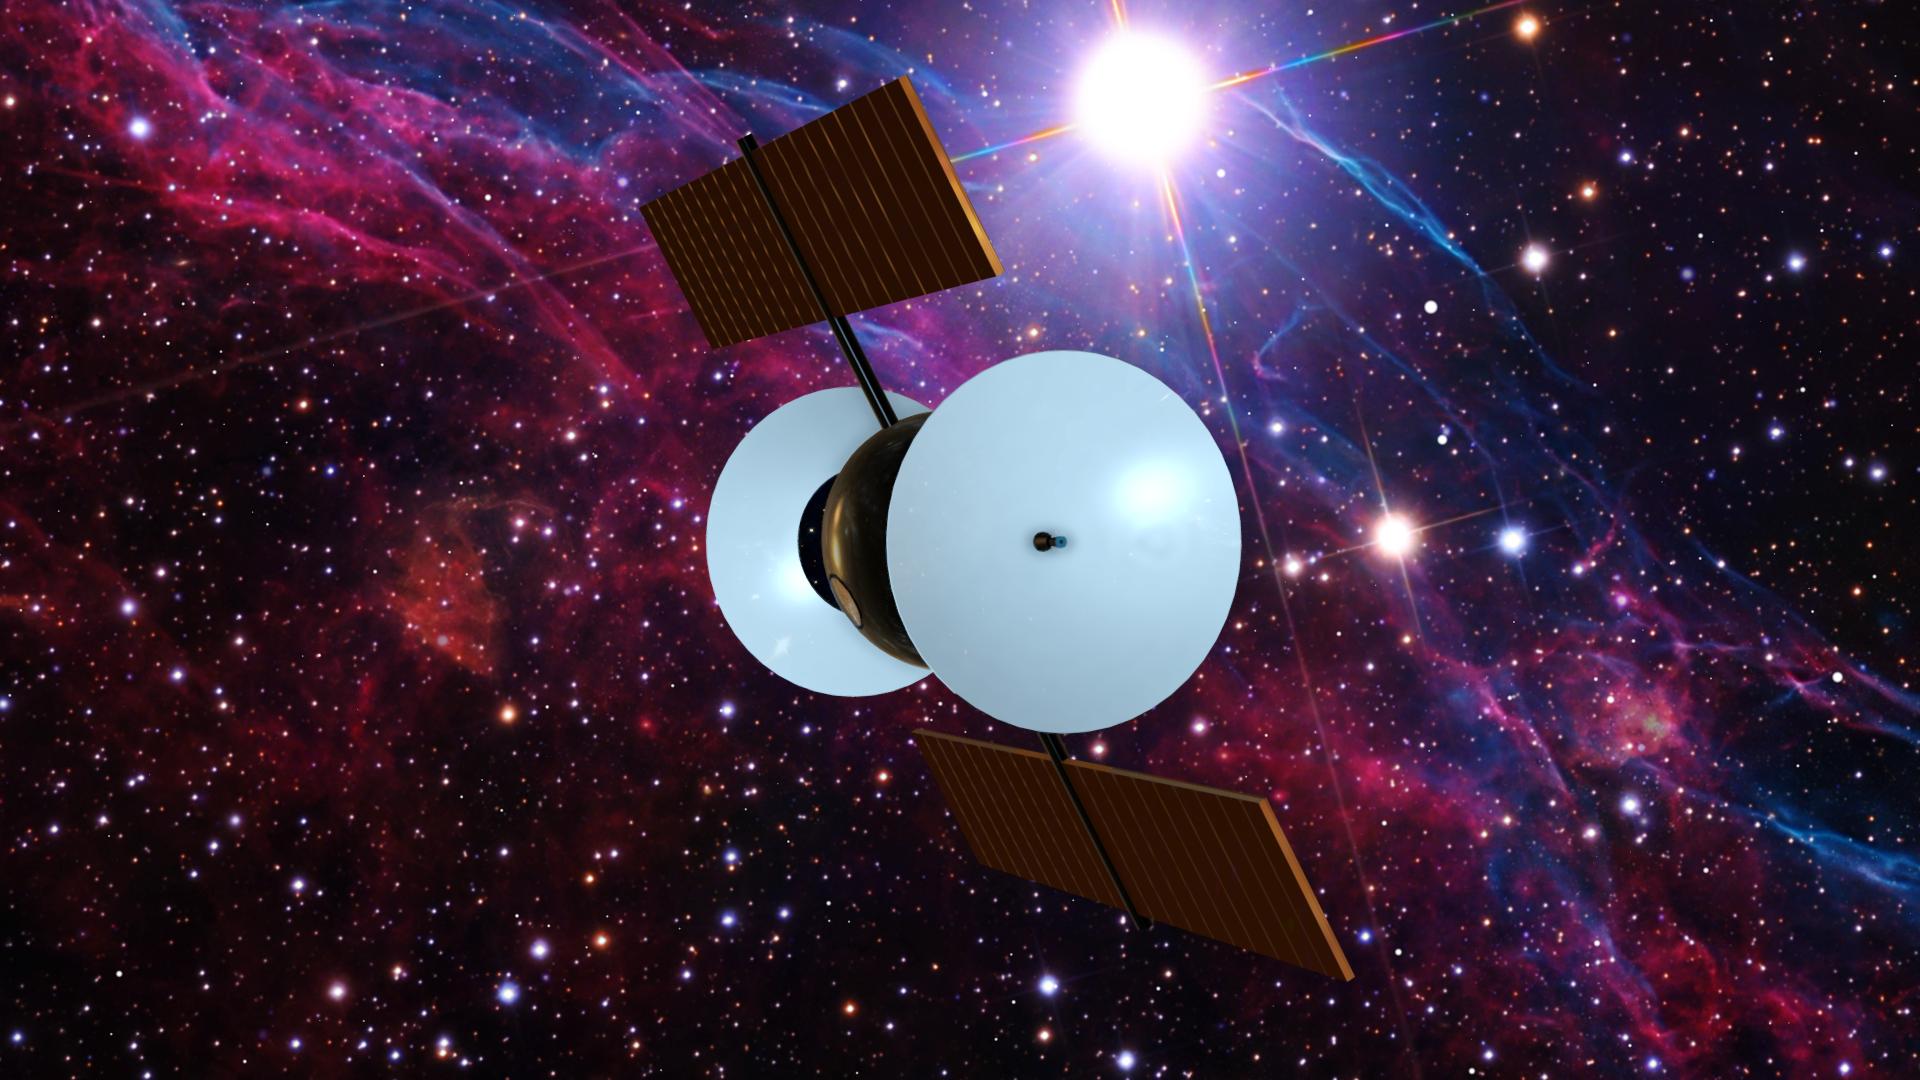 space probe models - photo #16